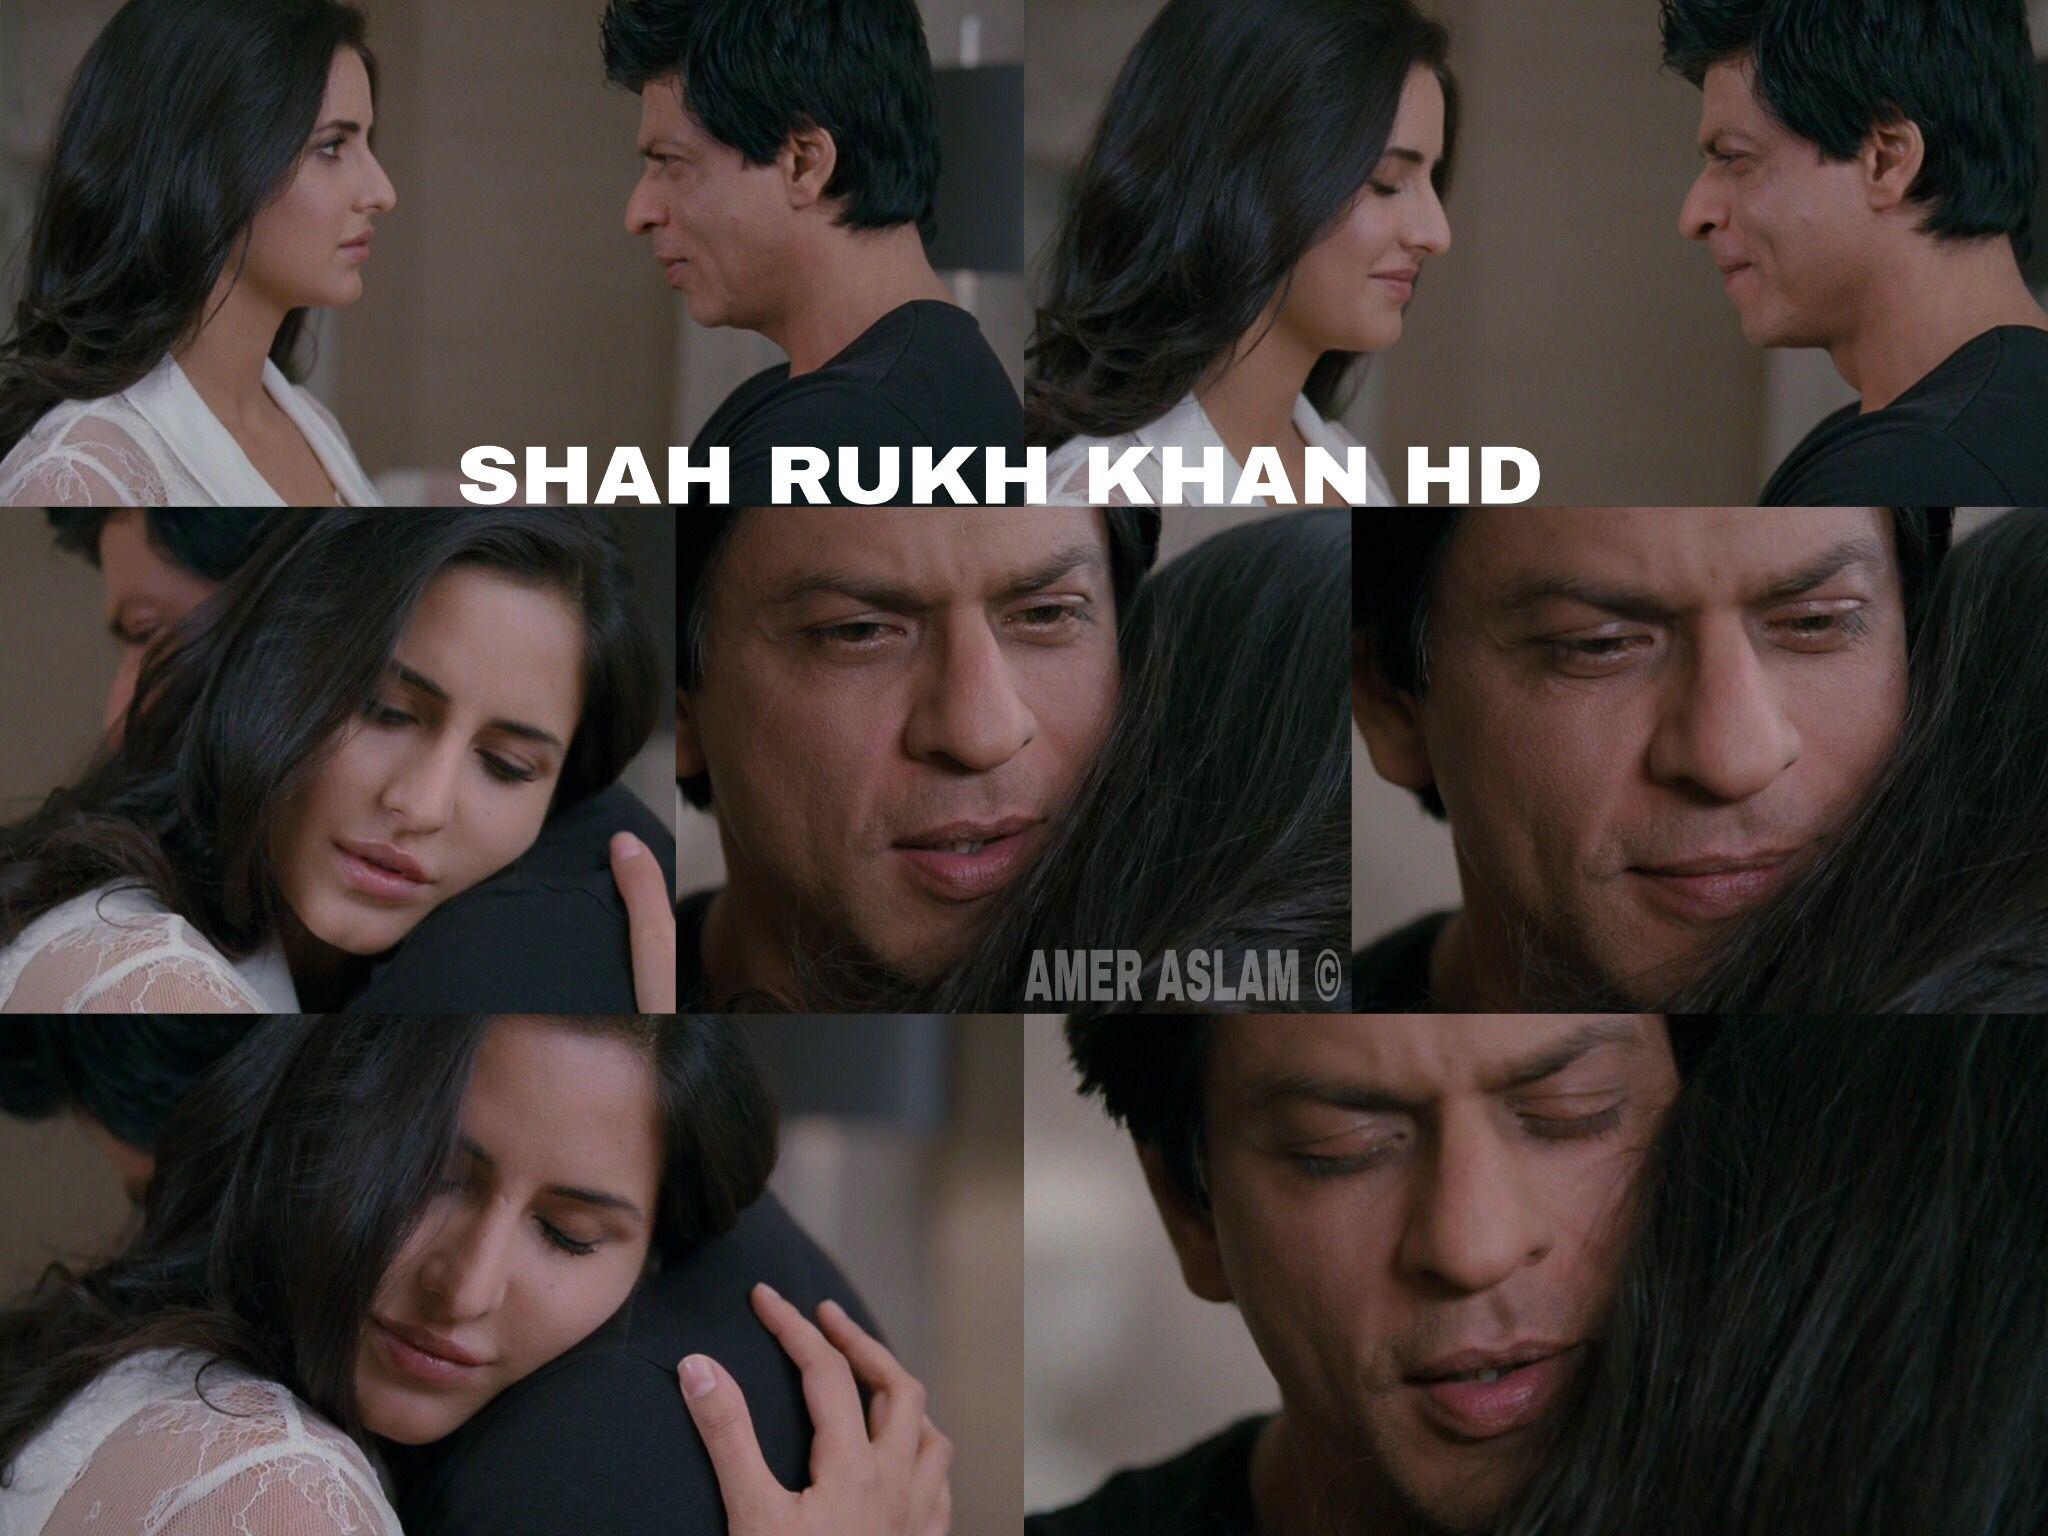 Meera Und Samar Solang Ich Lebe Shahrukhkhan Katrinakaif Jabtakhaijaan Jthj Yrf Movie Posters Movies Fictional Characters